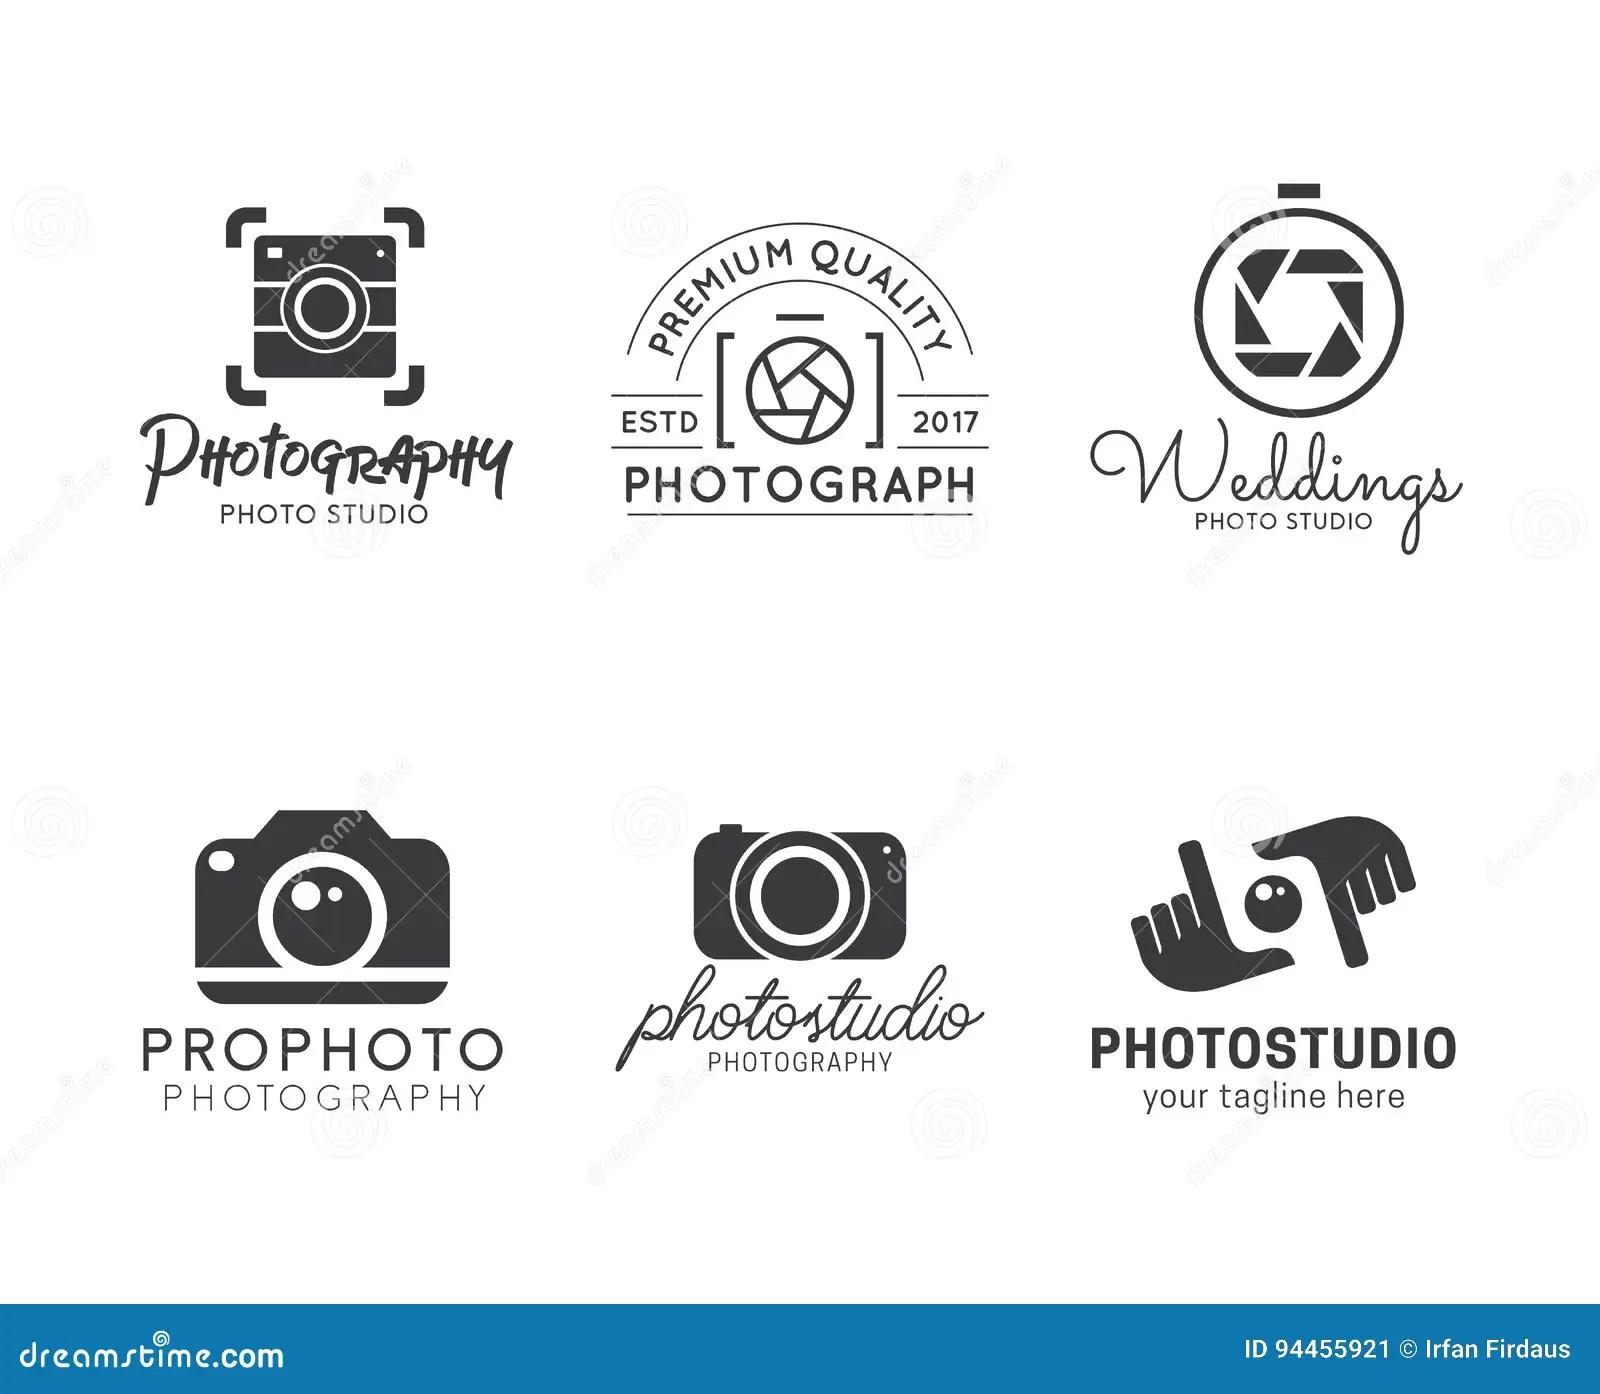 Infinity Focus Lens Macro Royalty-Free Stock Image